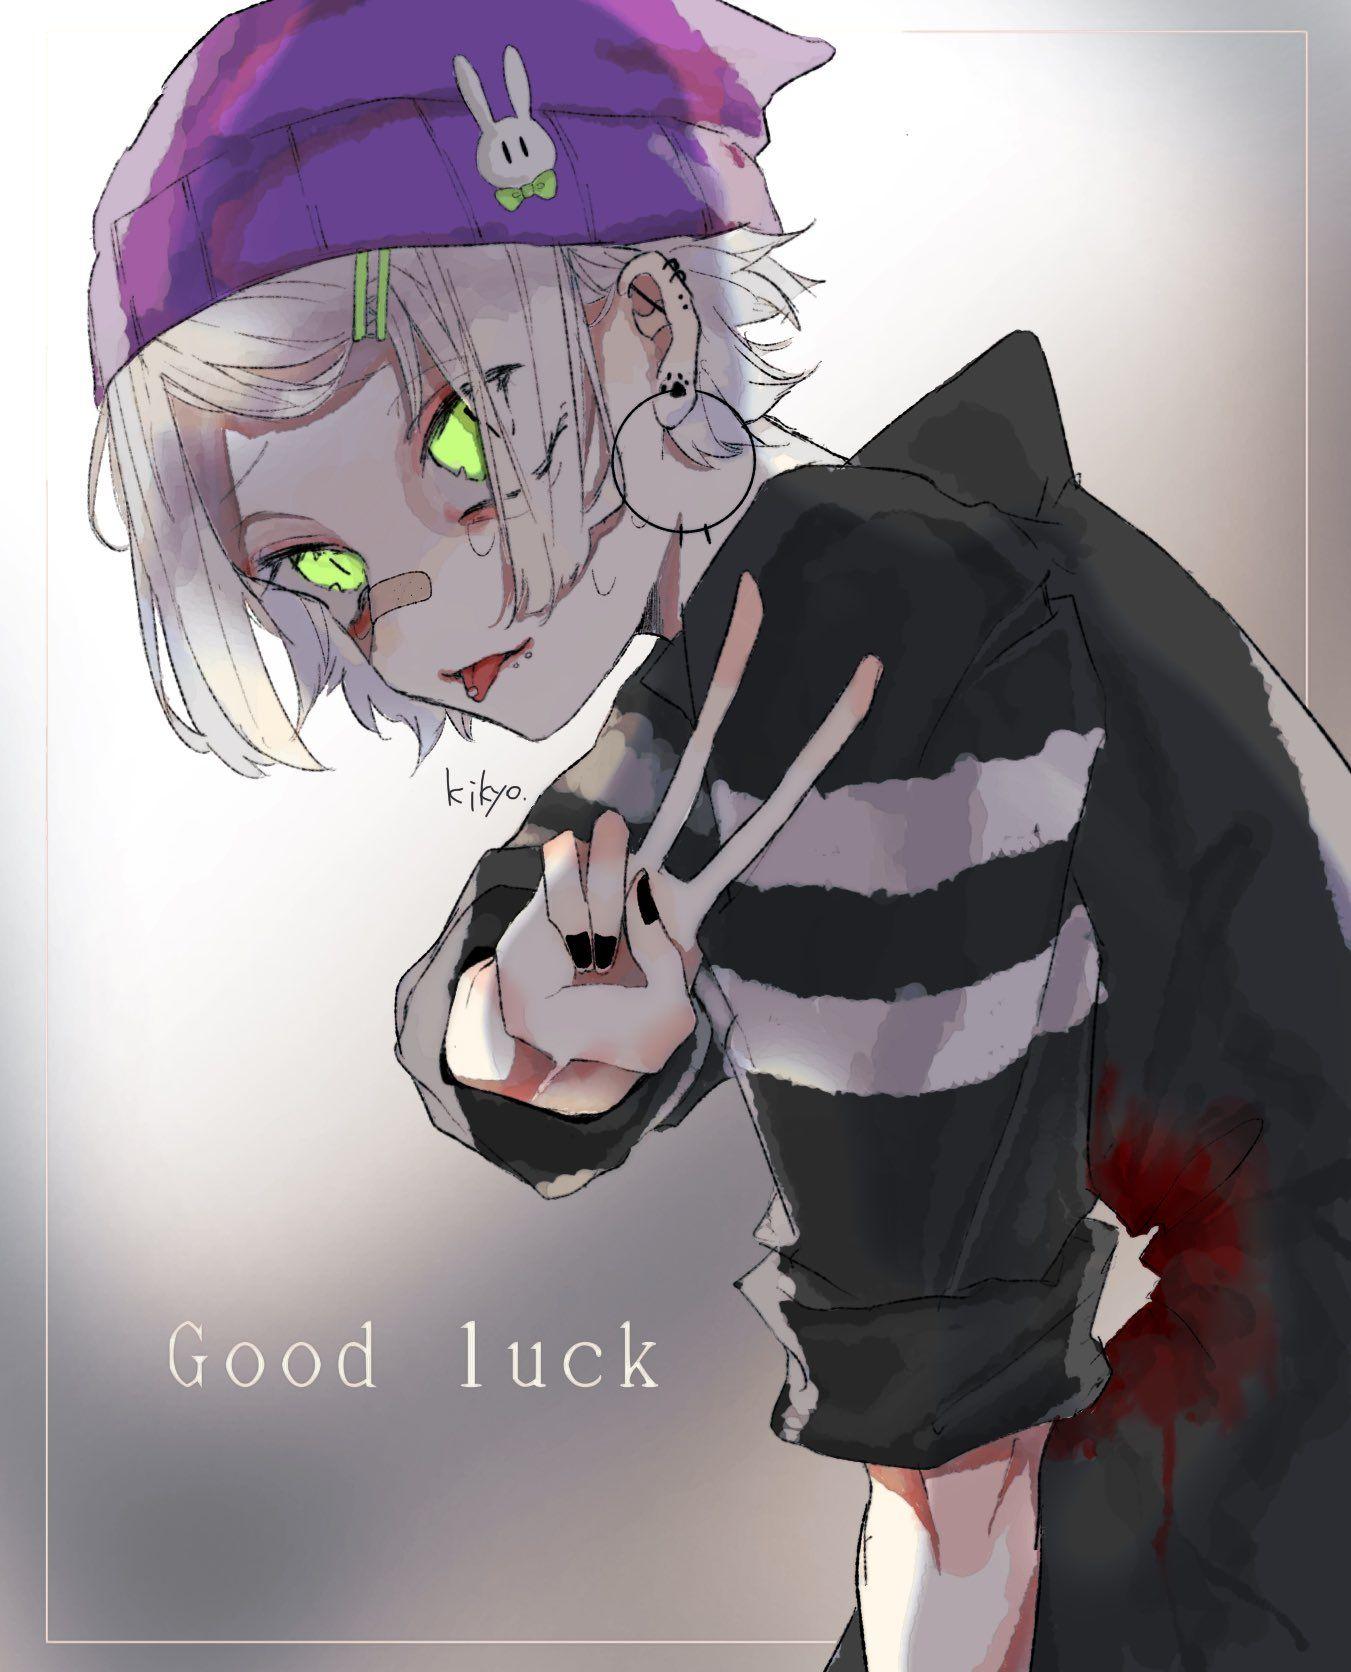 Twitter In 2020 Anime Drawings Boy Cute Anime Guys Anime Demon Boy